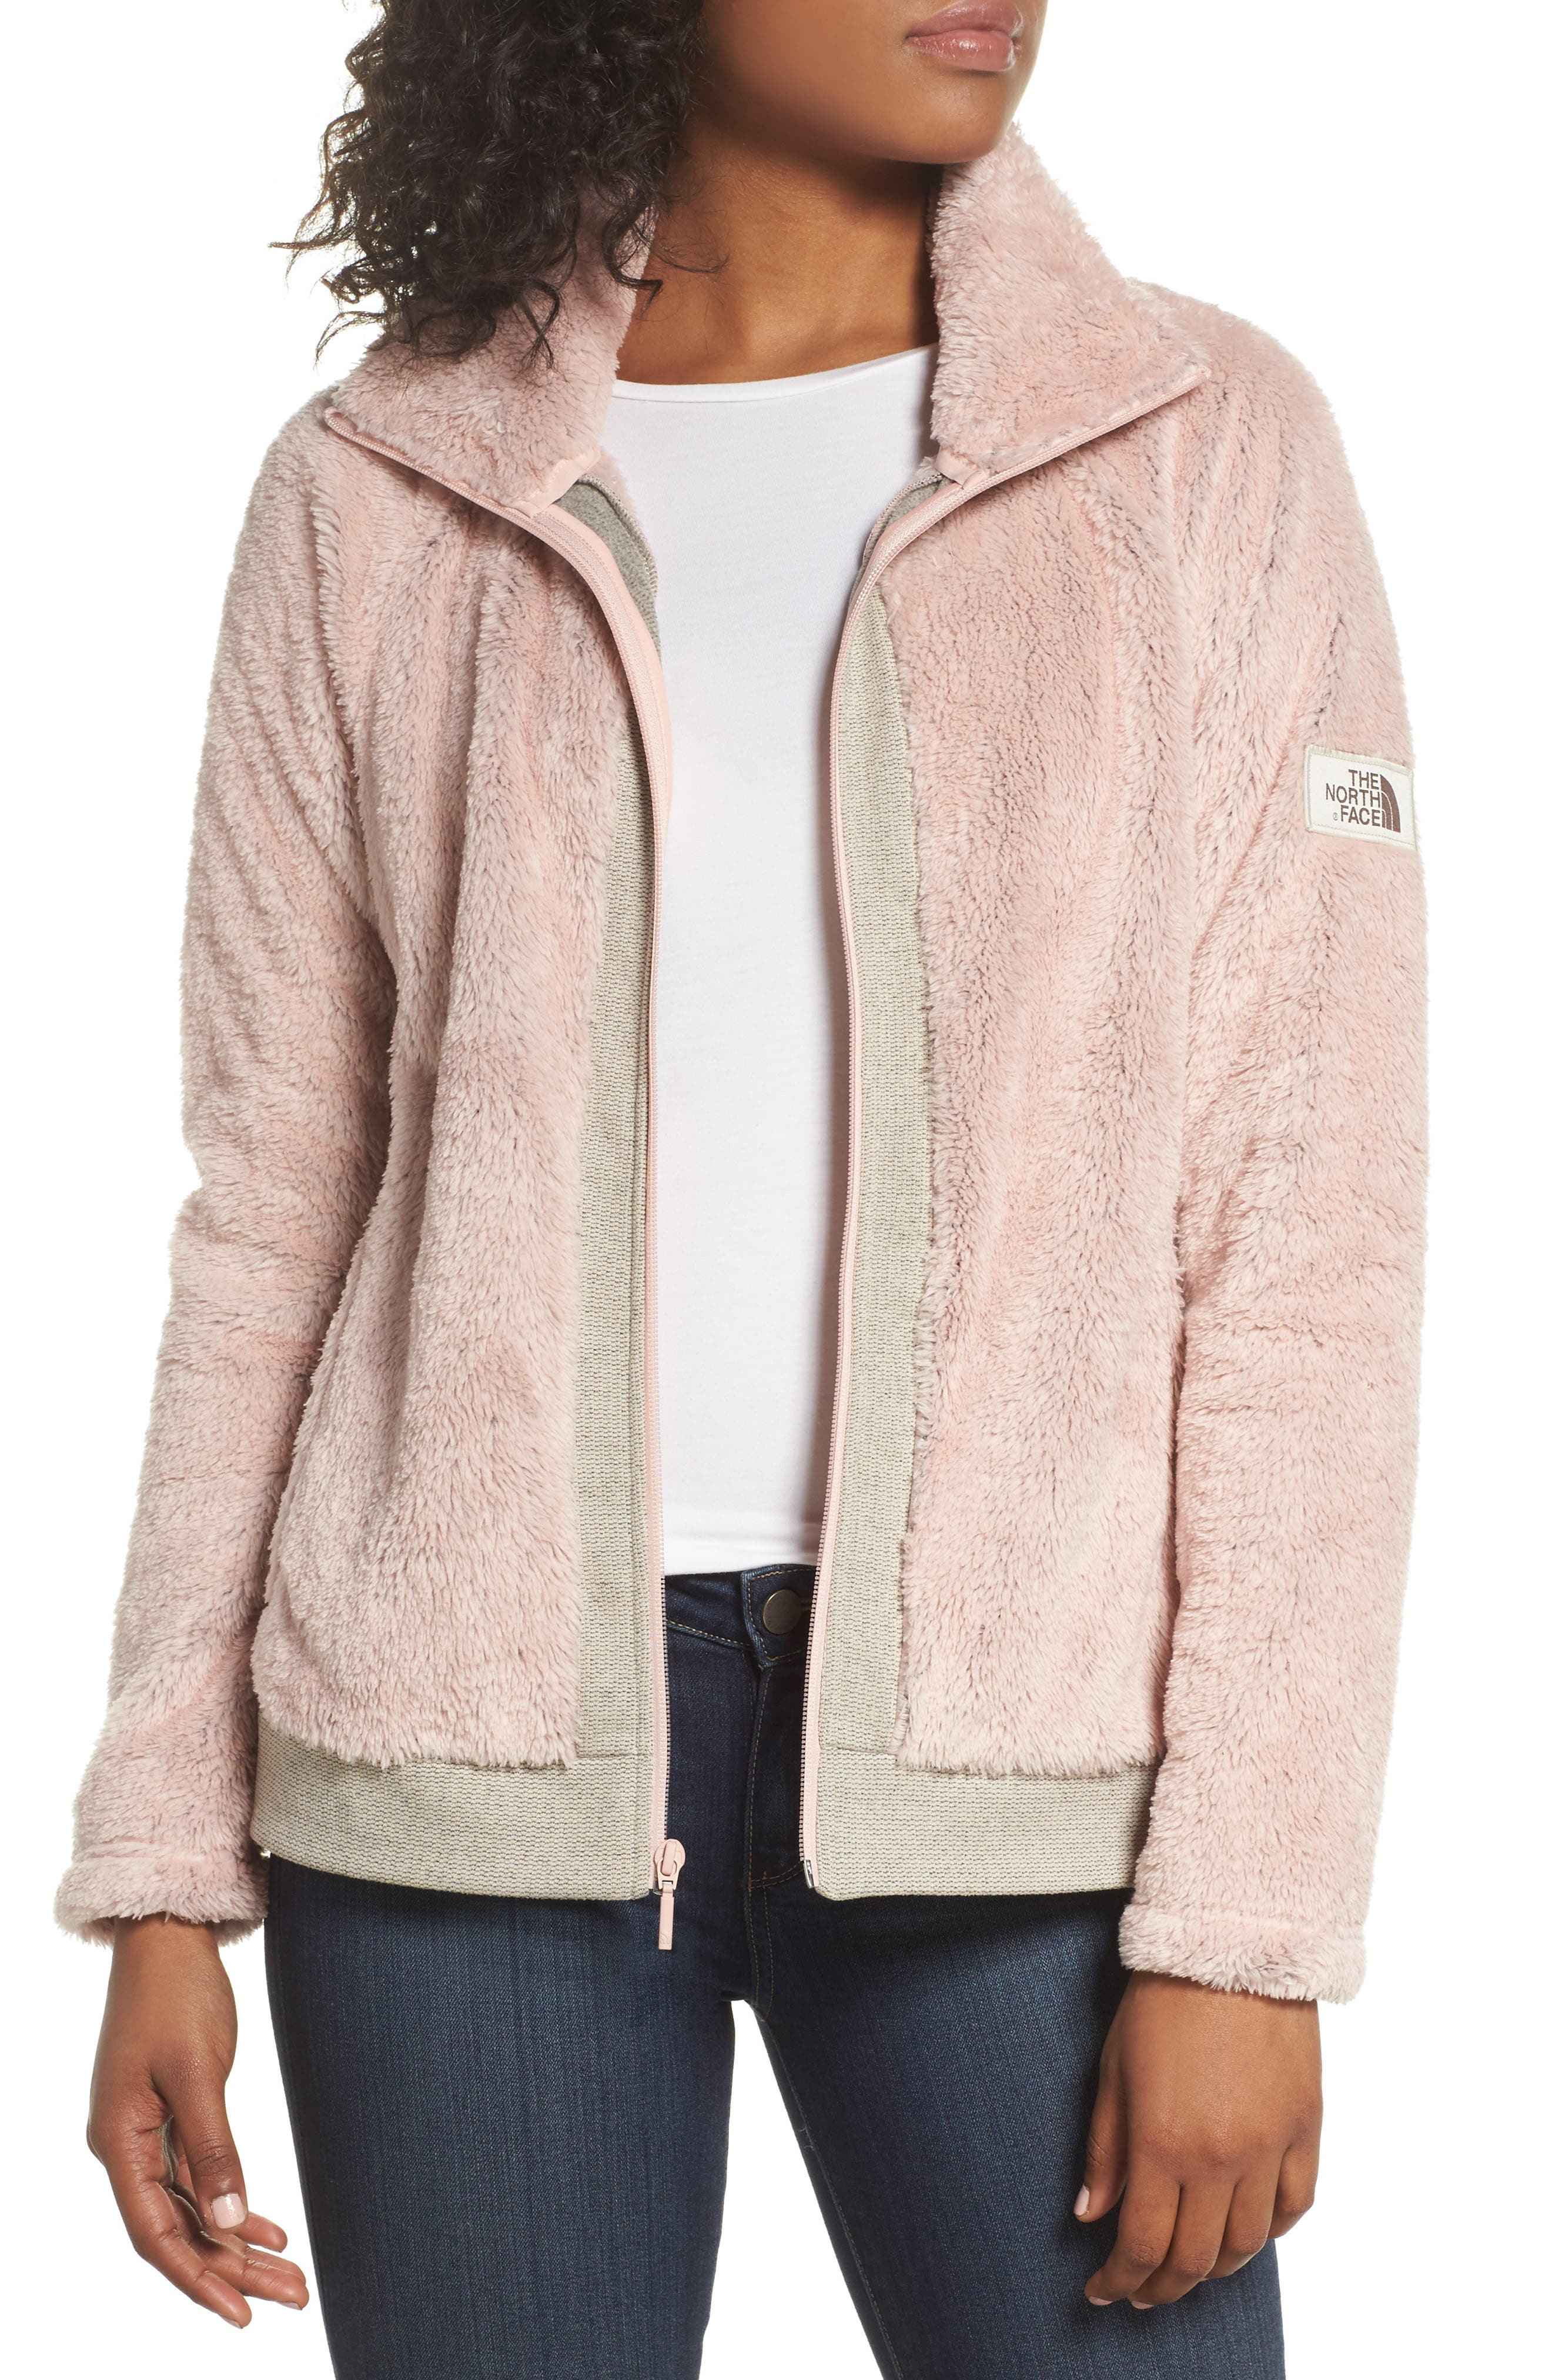 Furry Fleece Jacket,                         Main,                         color, Evening Sand Pink